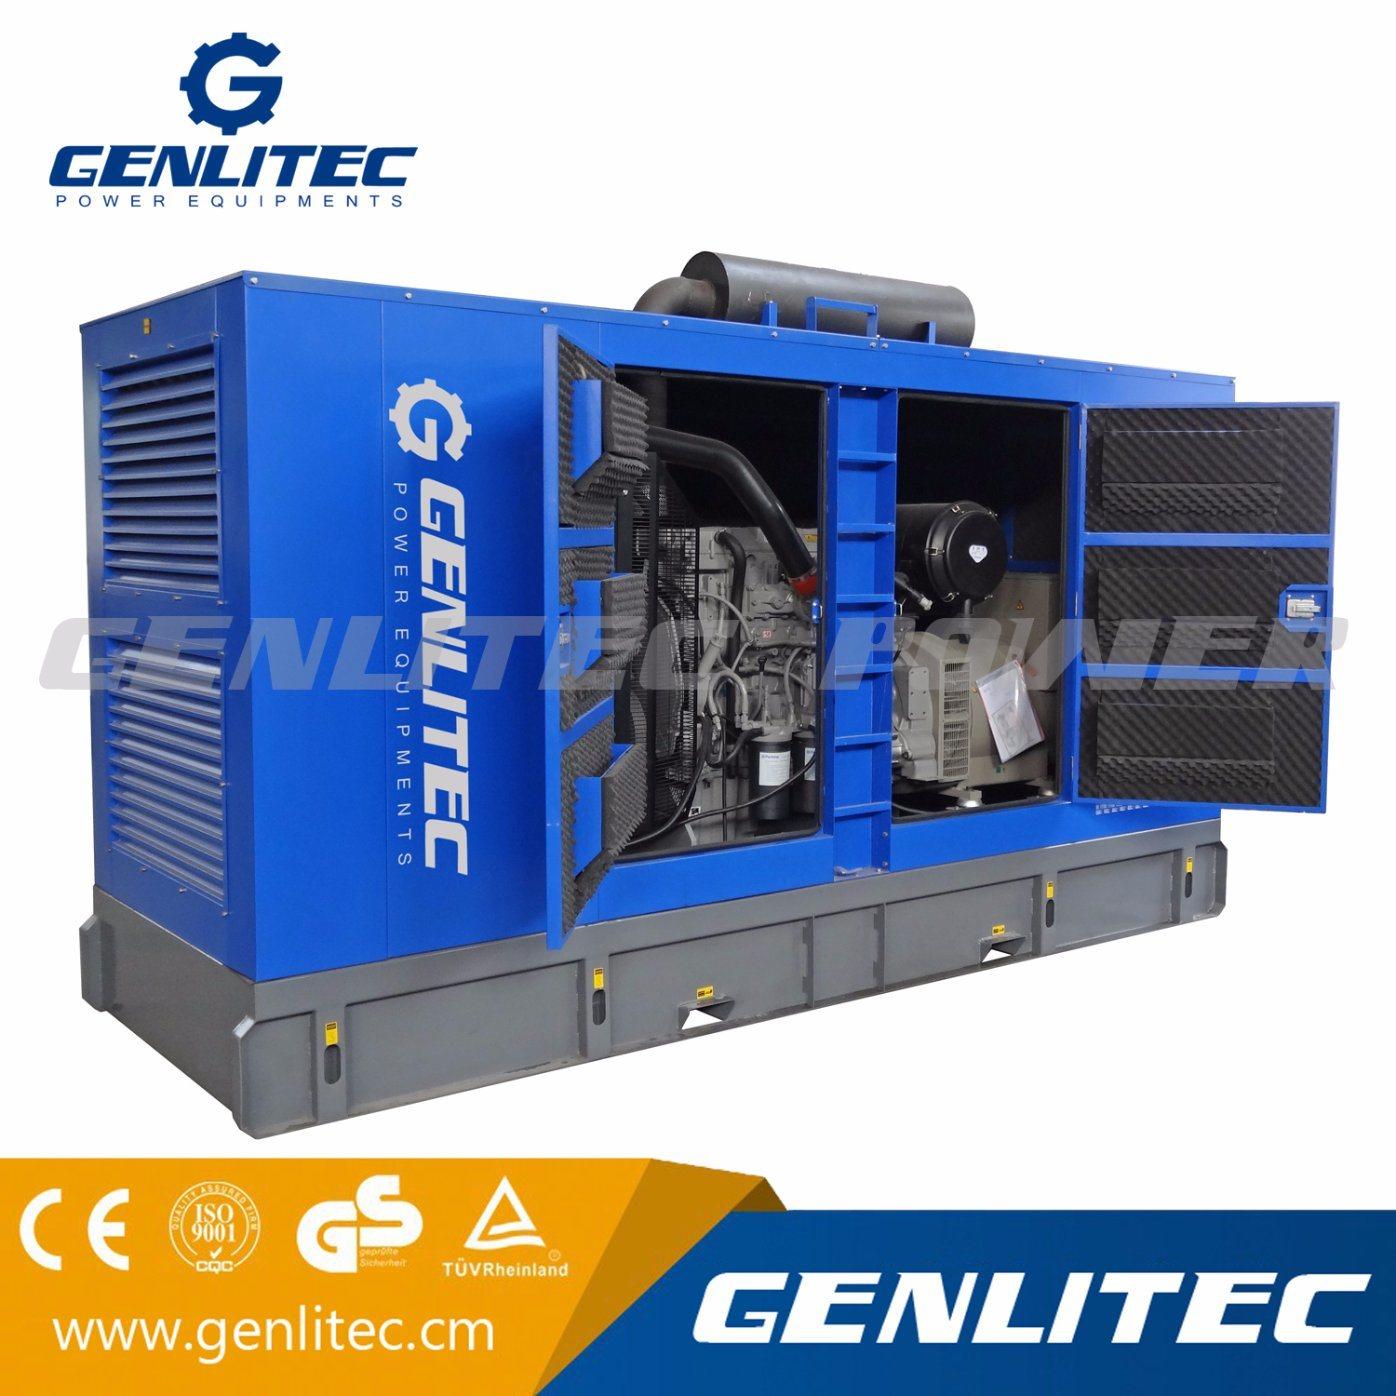 China Original UK 350 kVA Silent Diesel Power Generator Set with